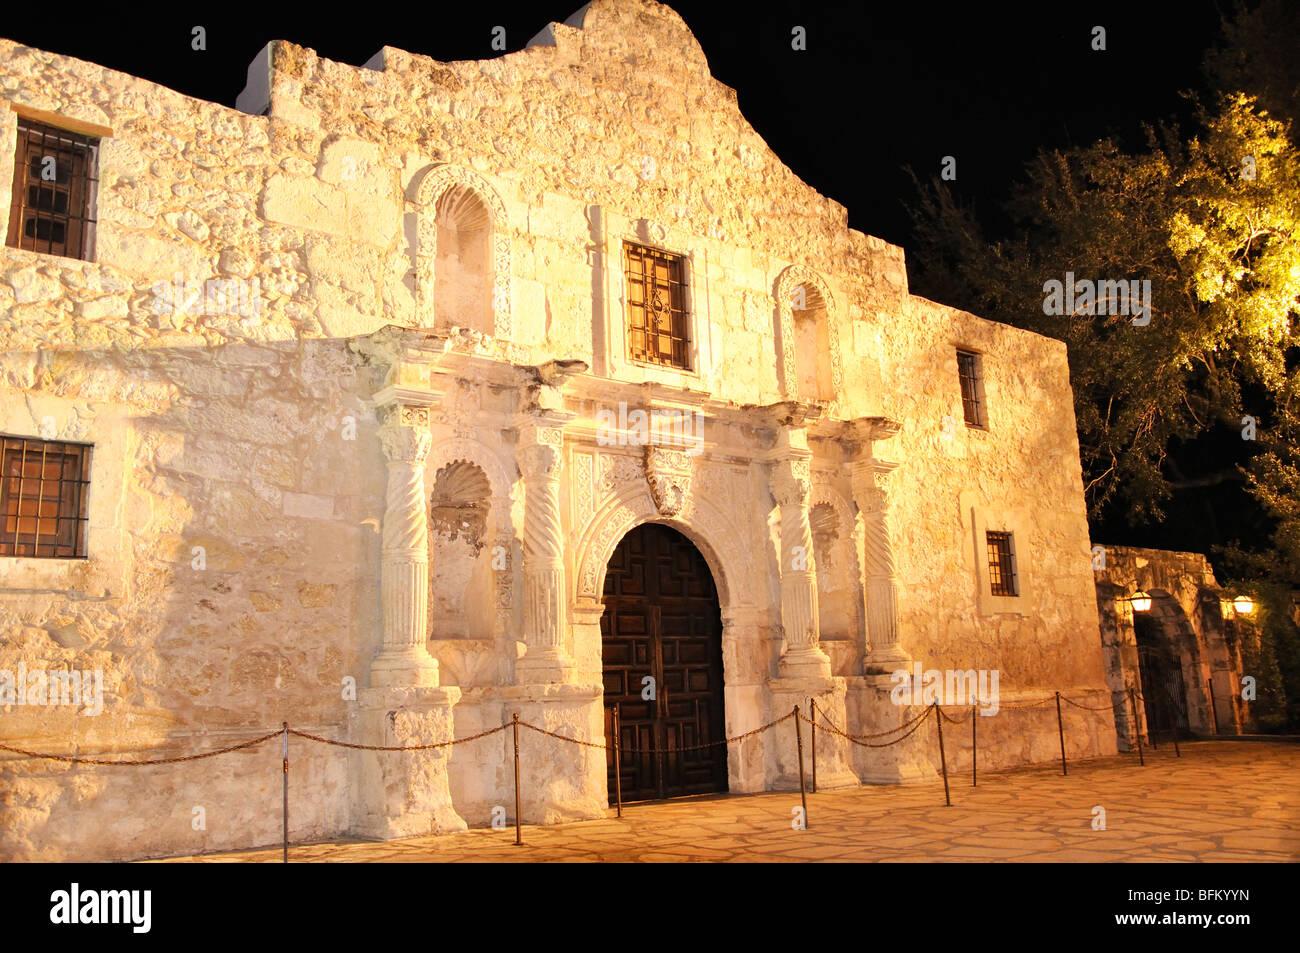 The Alamo, San Antonio, Texas, USA - Stock Image